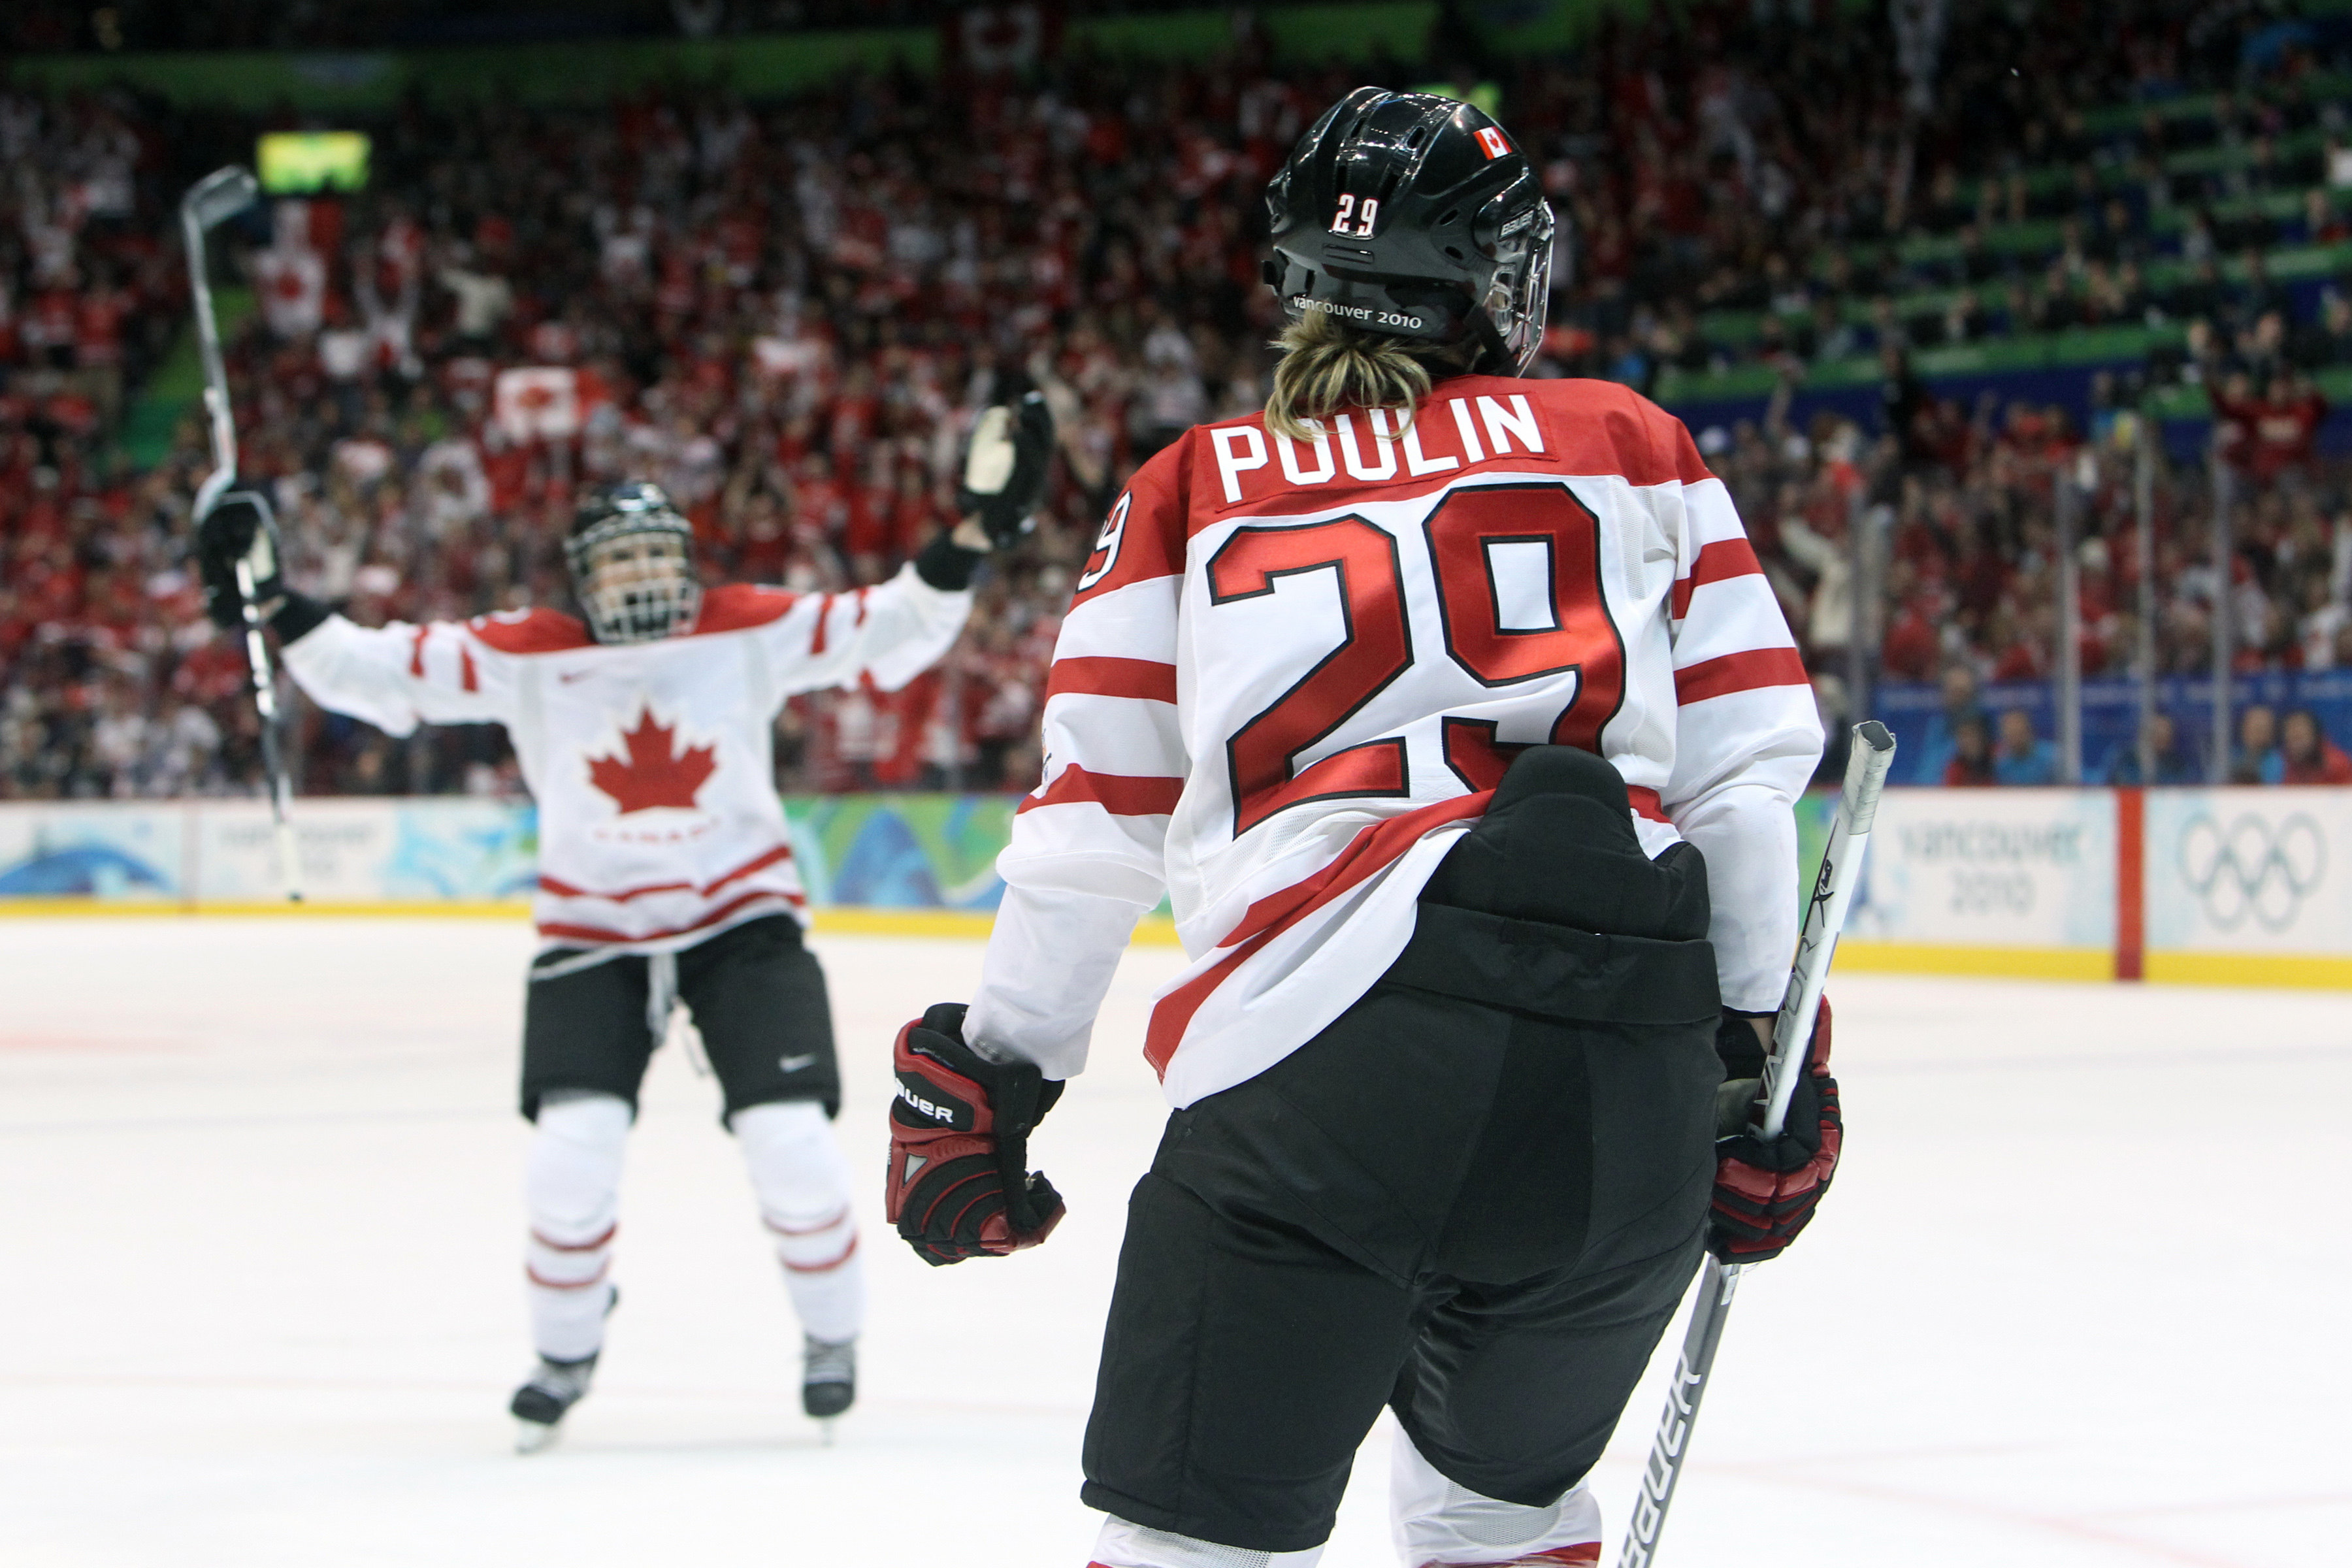 Vancouver 2010 - Ice Hockey - Women's Finals - Canada vs. USA